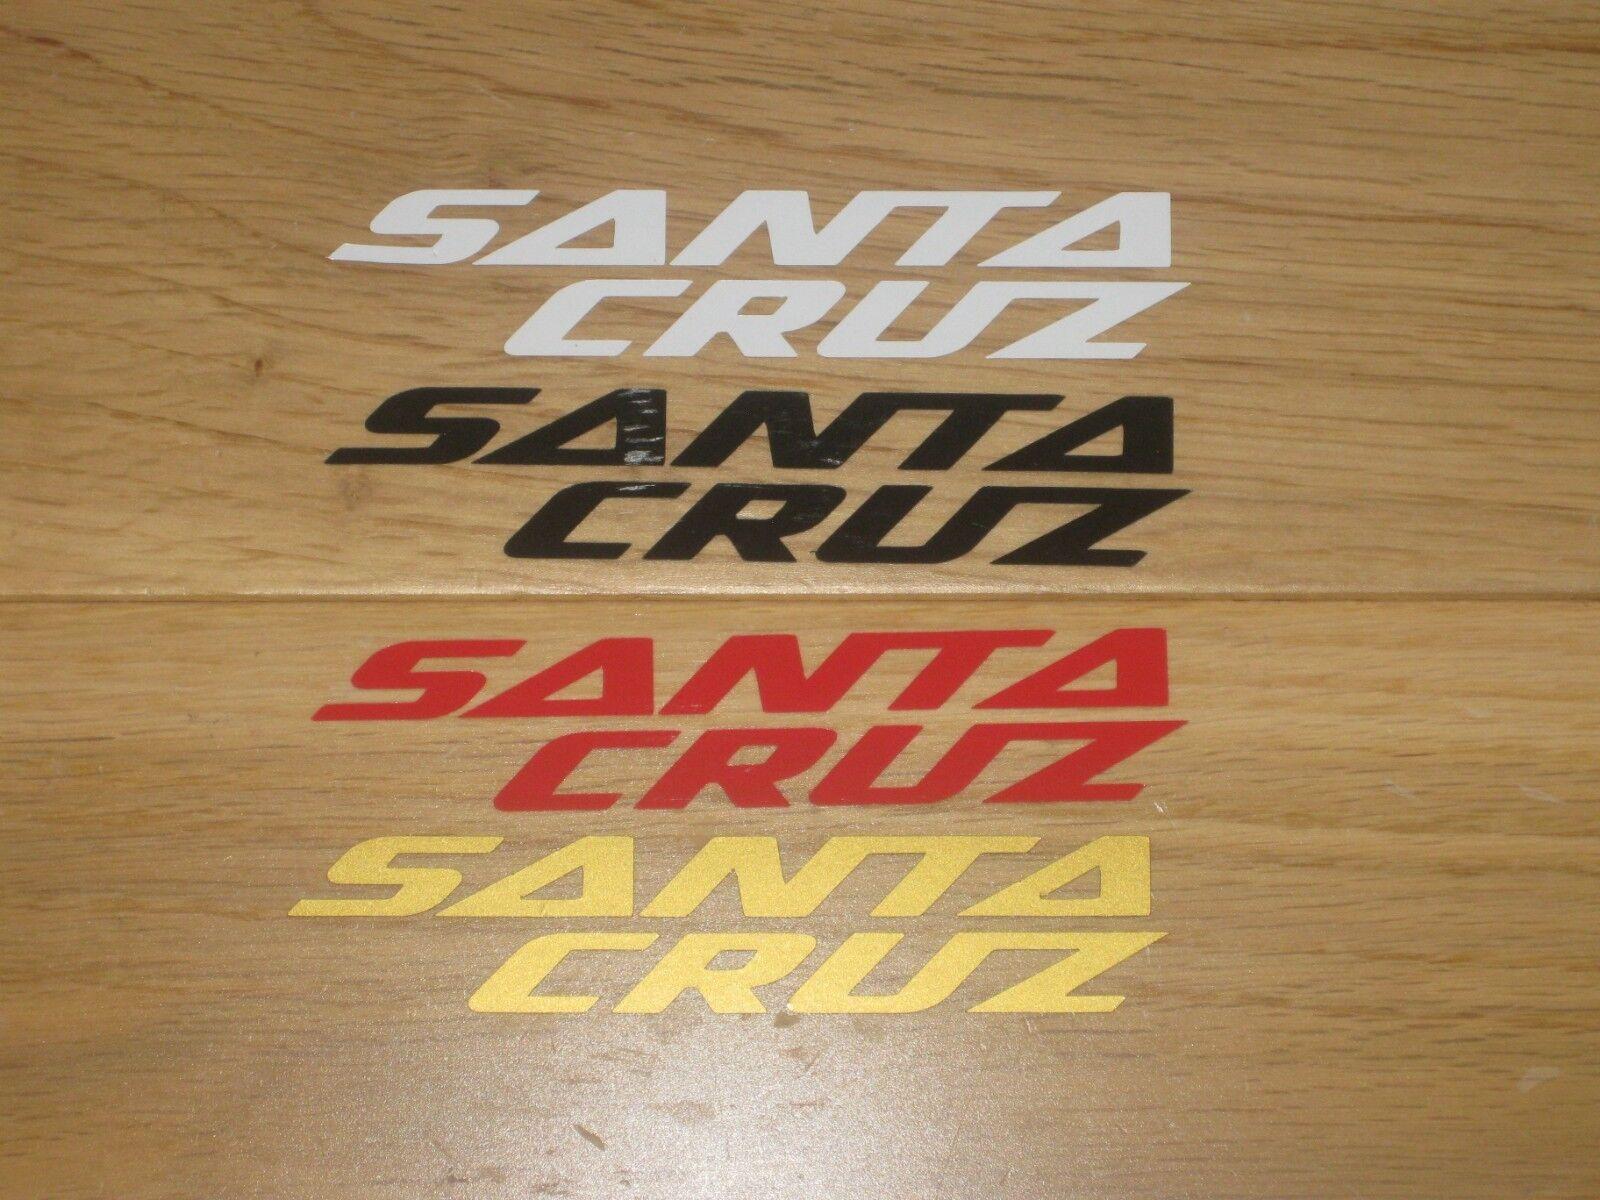 4 Santa Cruz imprimé DECAL STICKERS MOTO DECAL imprimé cycling frame forks Téléphone Casque Box 5751e5